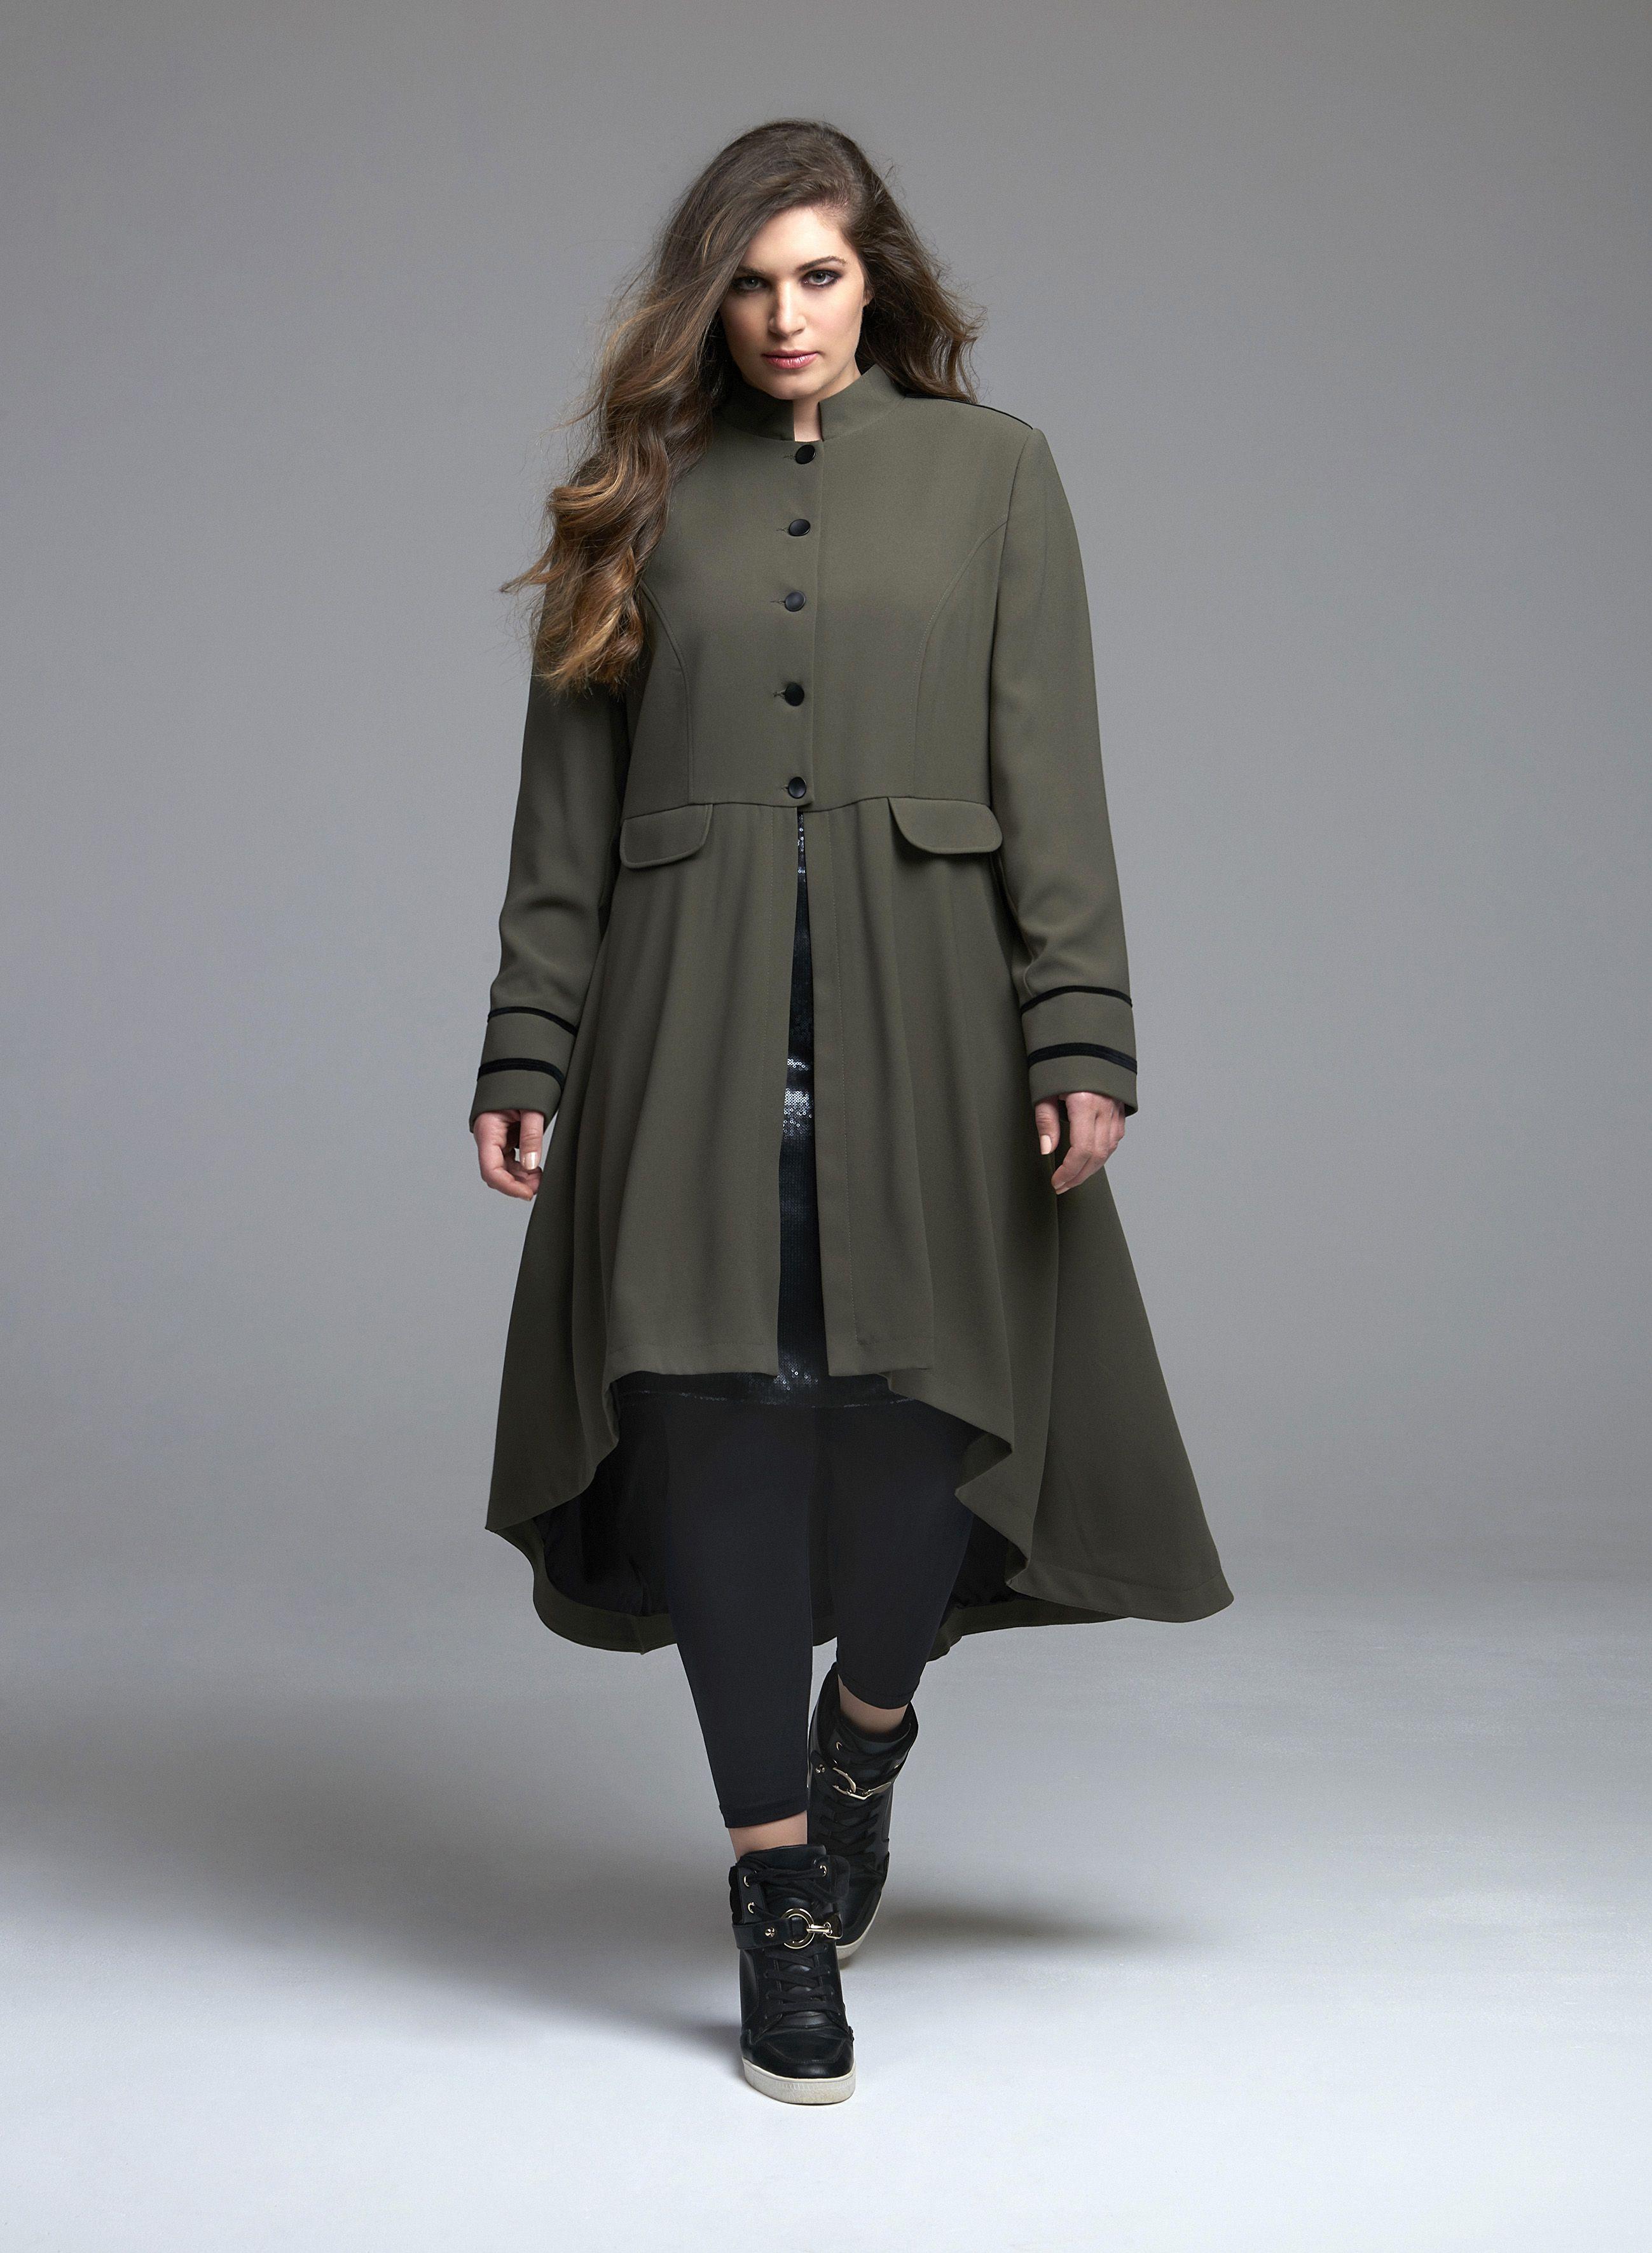 The Camo Trend    MAT FASHION F W 17-18  matfashion  fw1718  realsize   fashion  plussizefashion 38c8cd6f464